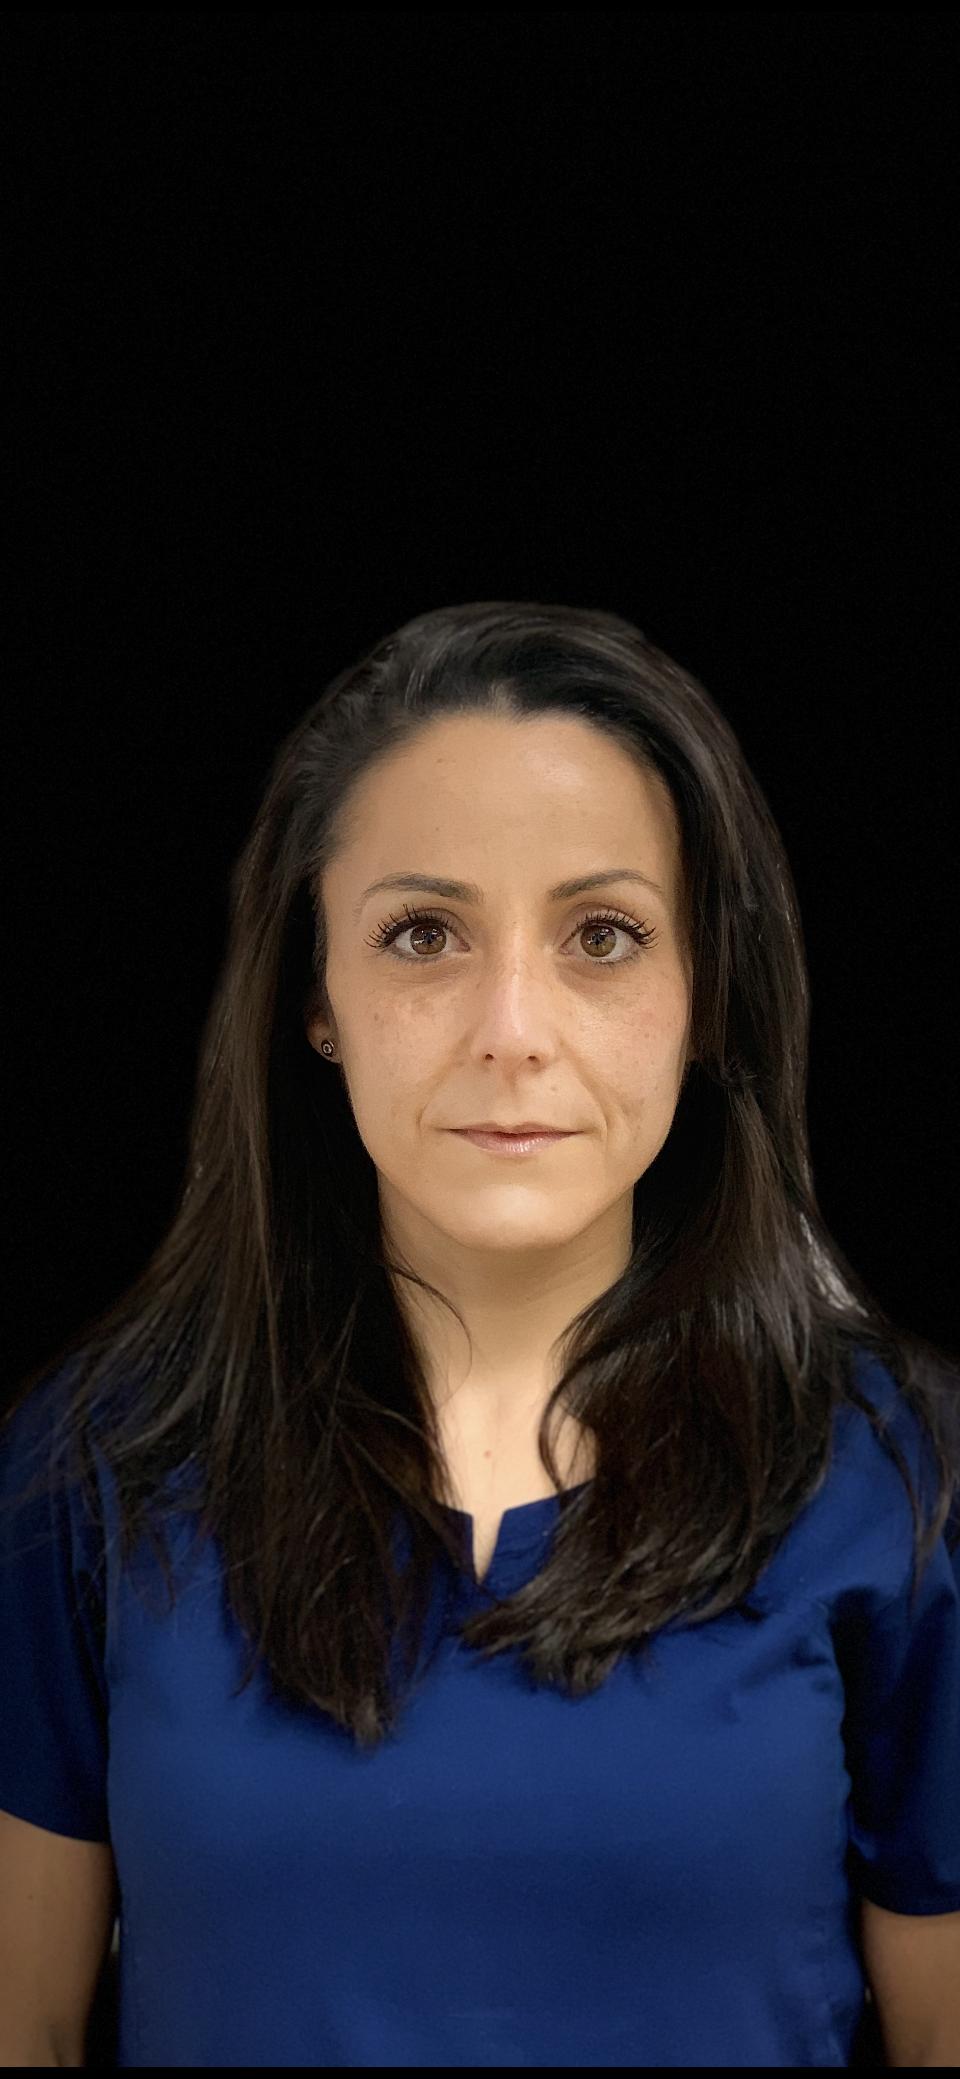 Elena Lupiáñez Alonso